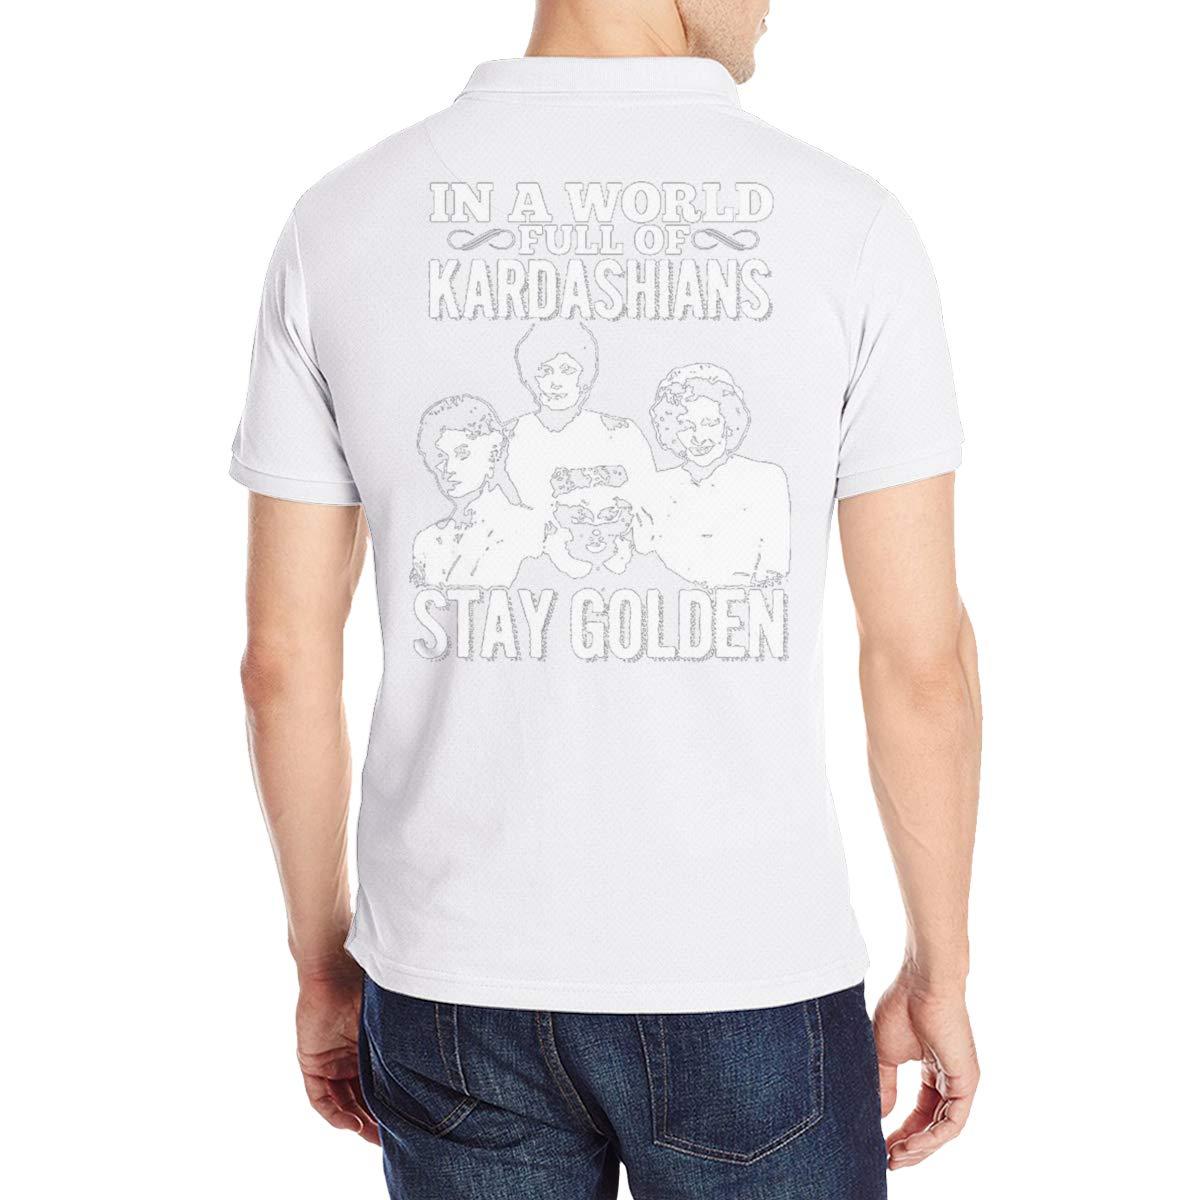 Arilce in?a?World?Full?Kardashians?Stay?Golden Men Polo Shirt Short Sleeve Lapel Blouse Black